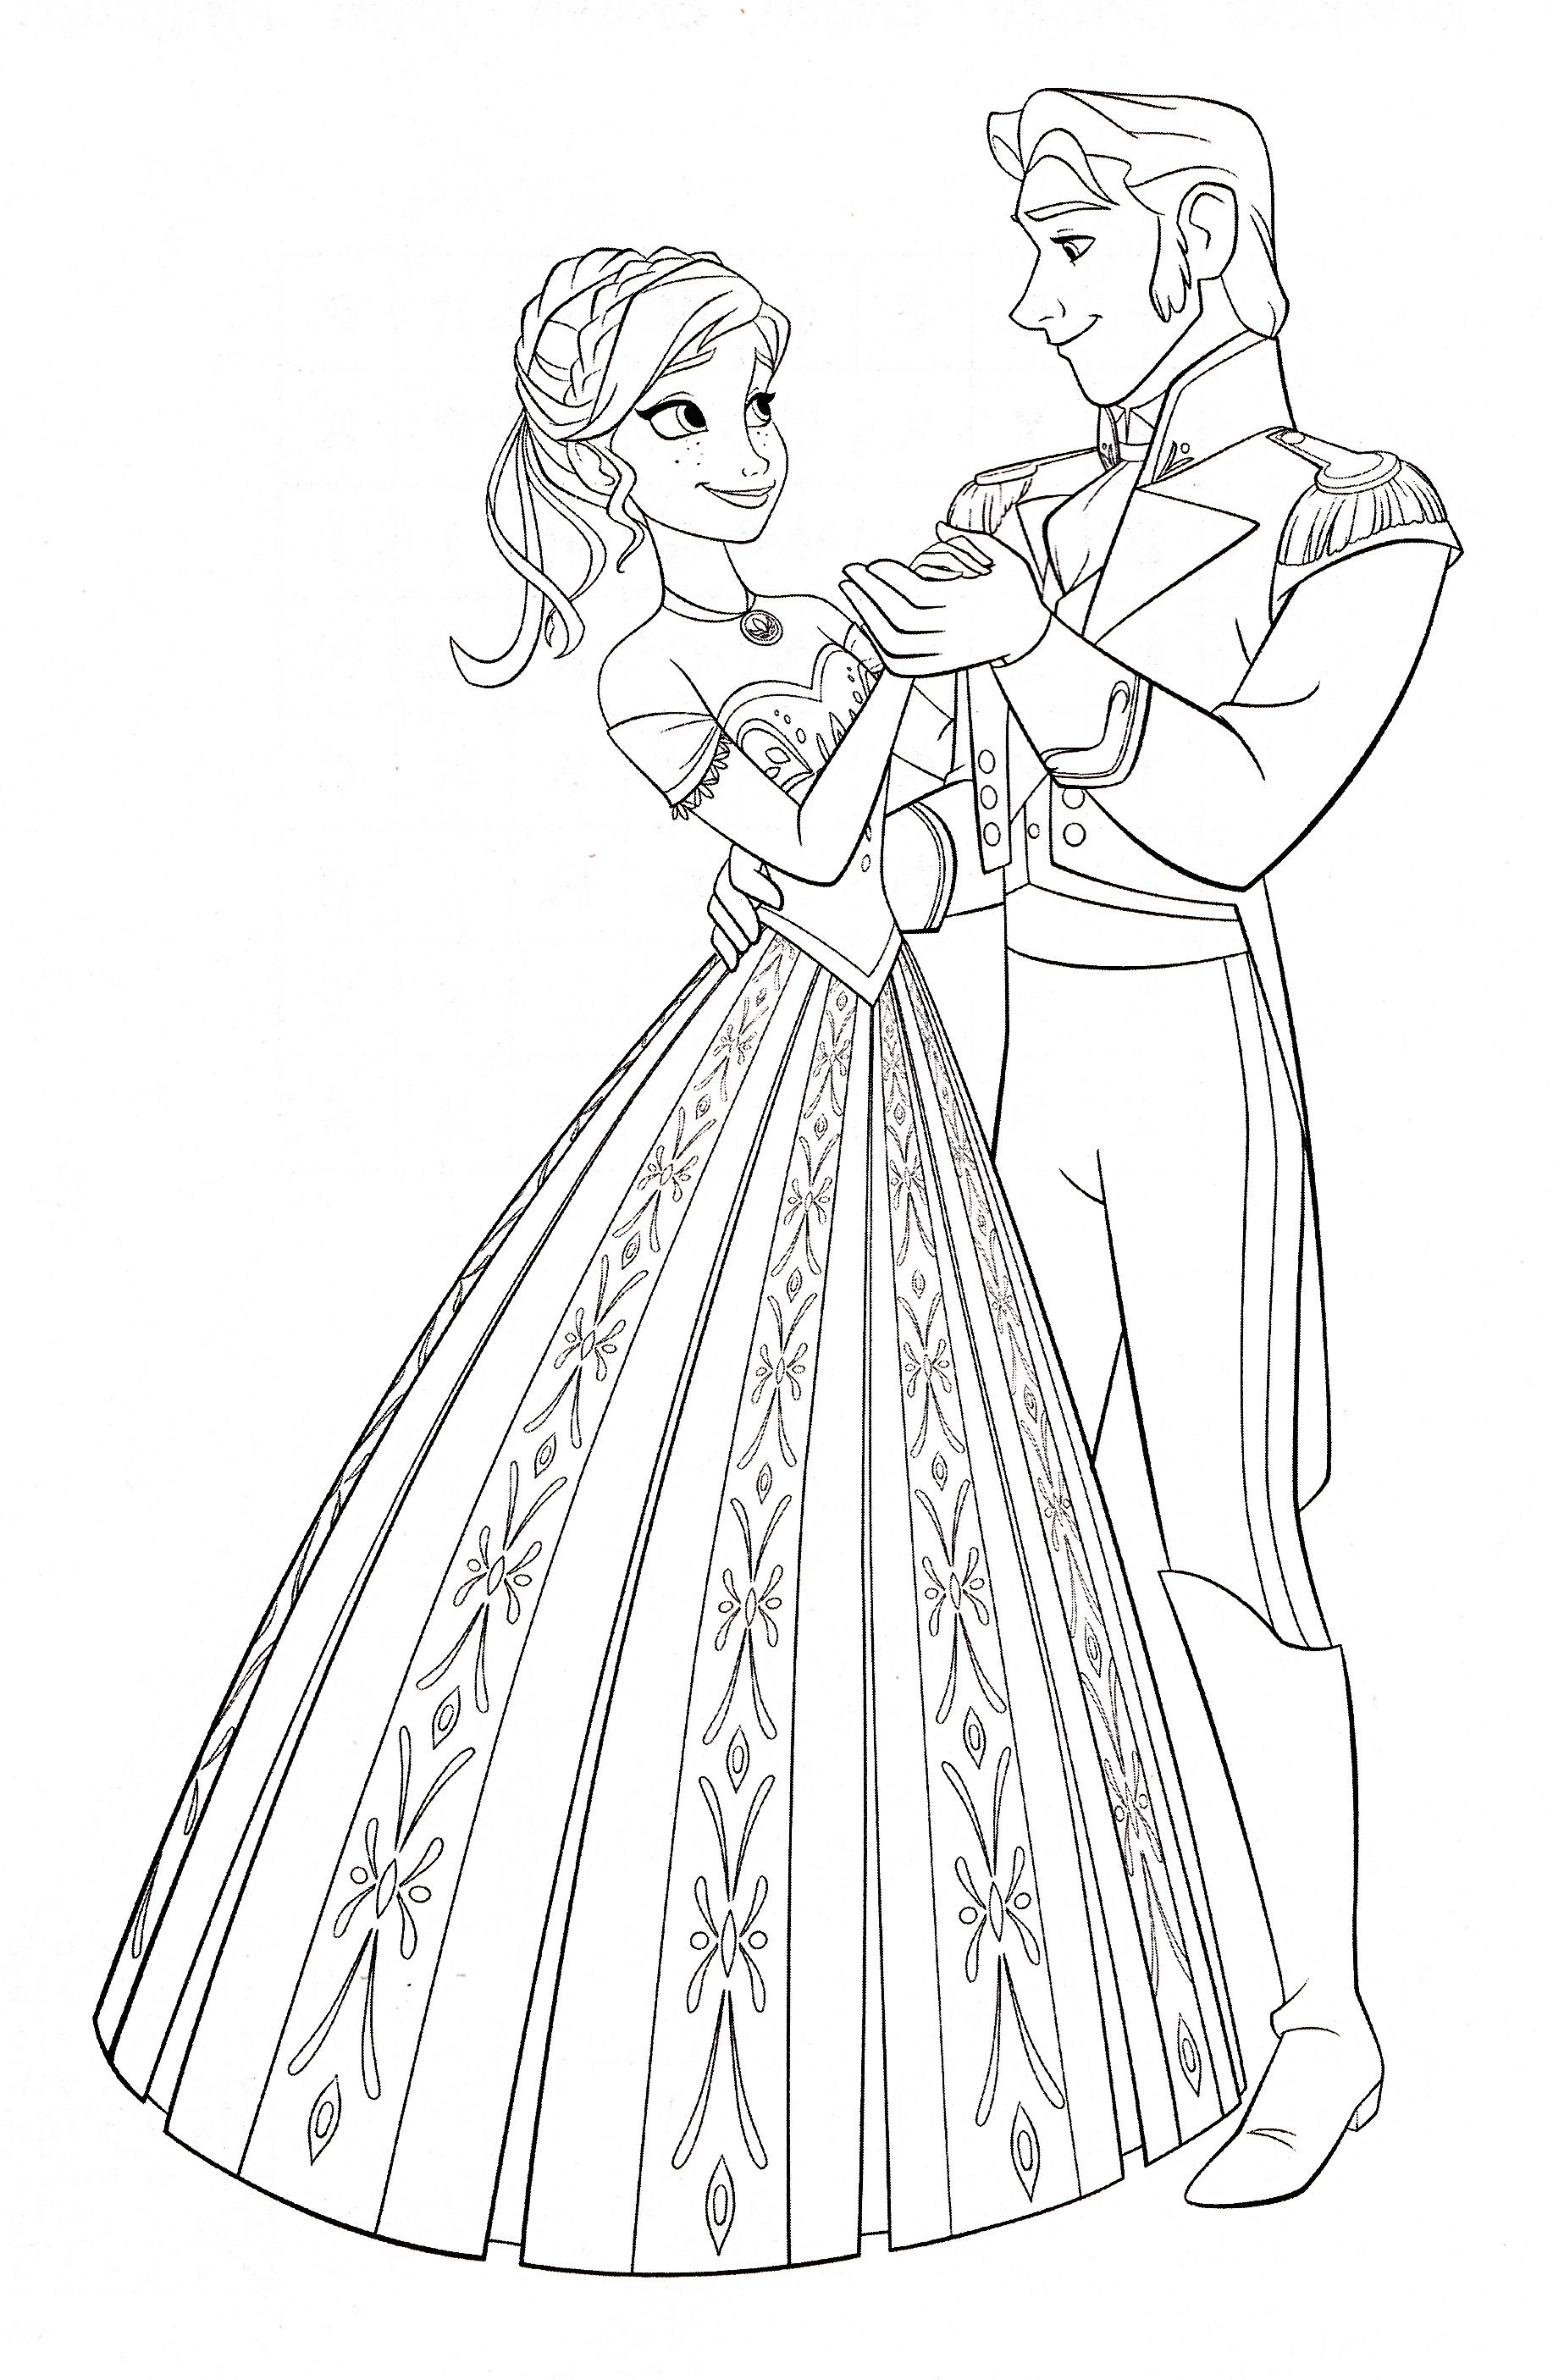 Walt-Disney-Coloring-Pages-Princess-Anna-Prince-Hans-walt